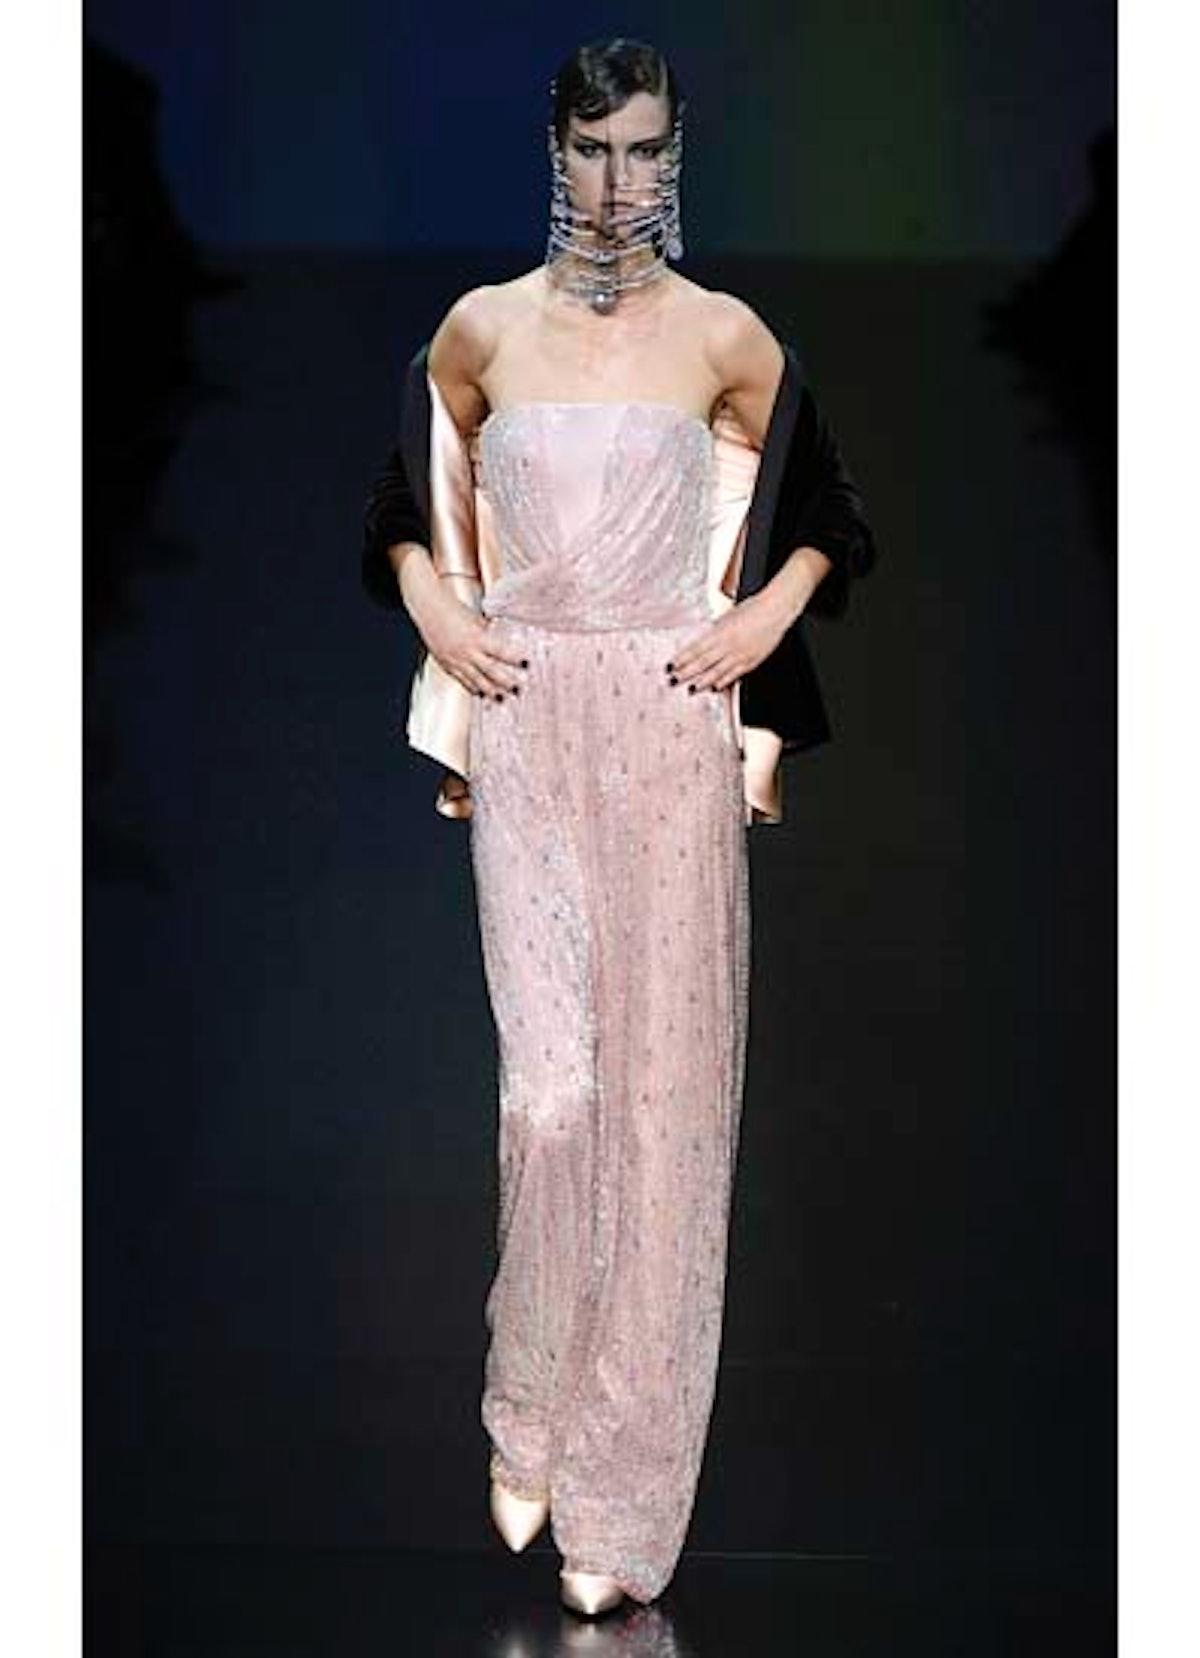 fass-giorgio-armani-couture-2012-runway-22-v.jpg